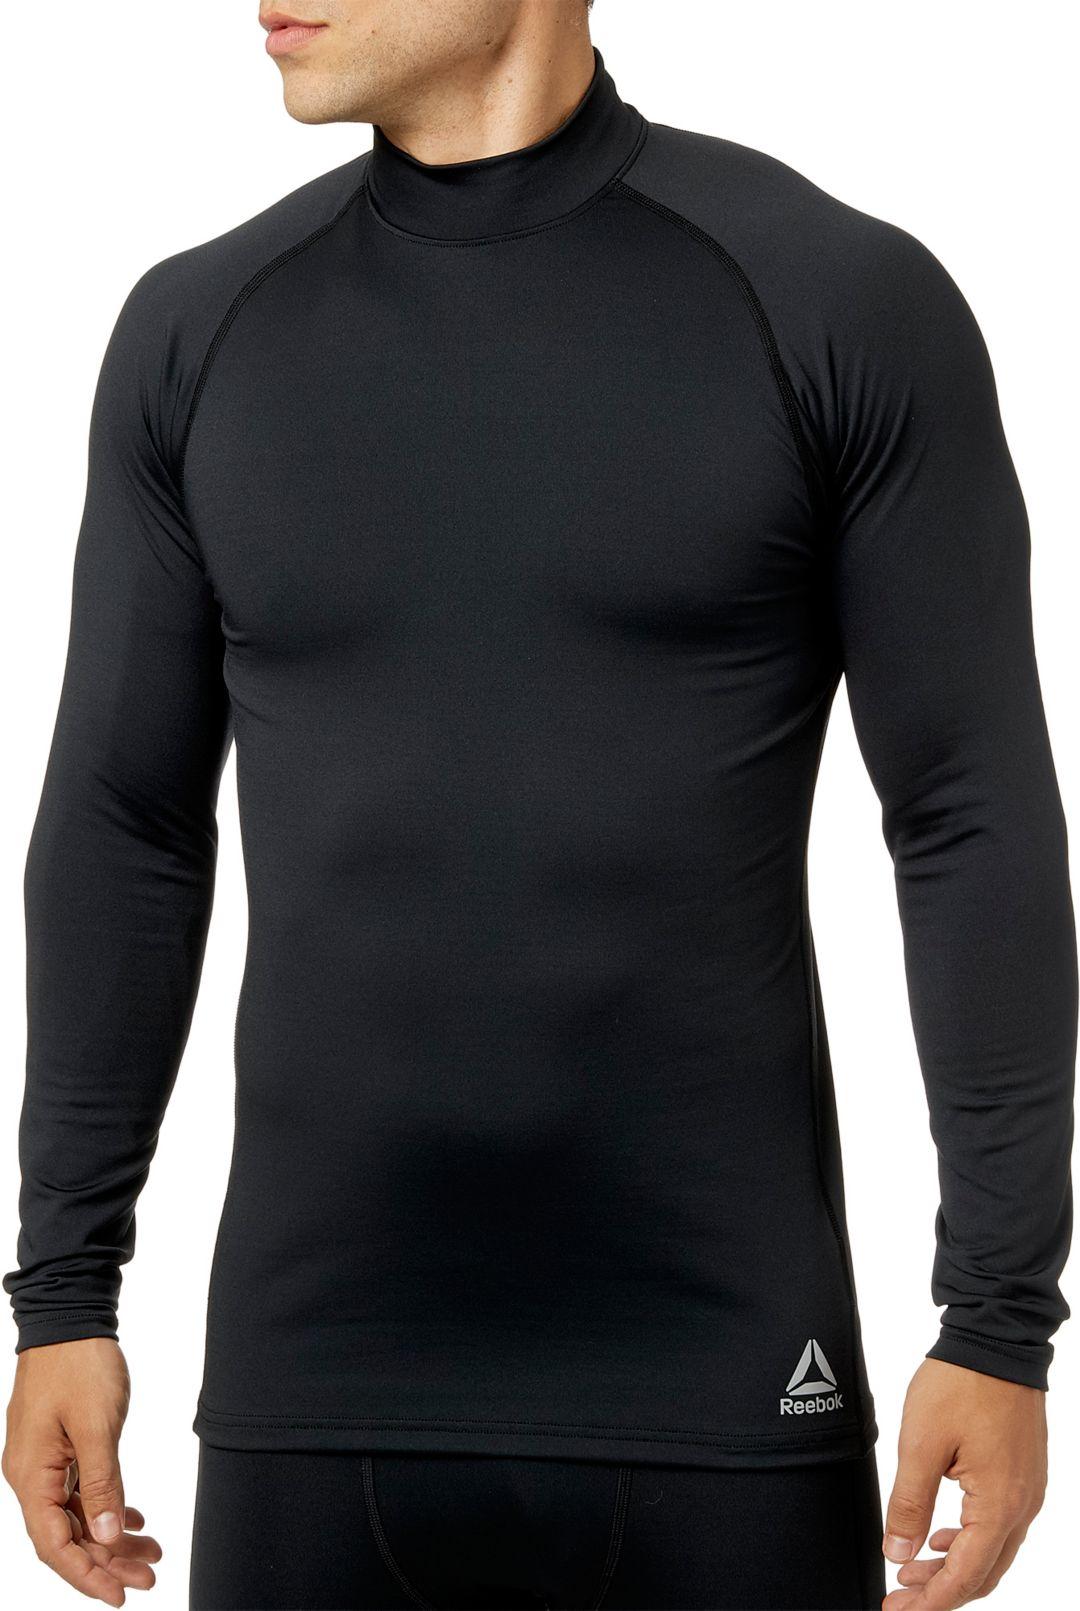 8ea4355ad3 Reebok Men's Cold Weather Compression Mock Neck Long Sleeve Shirt